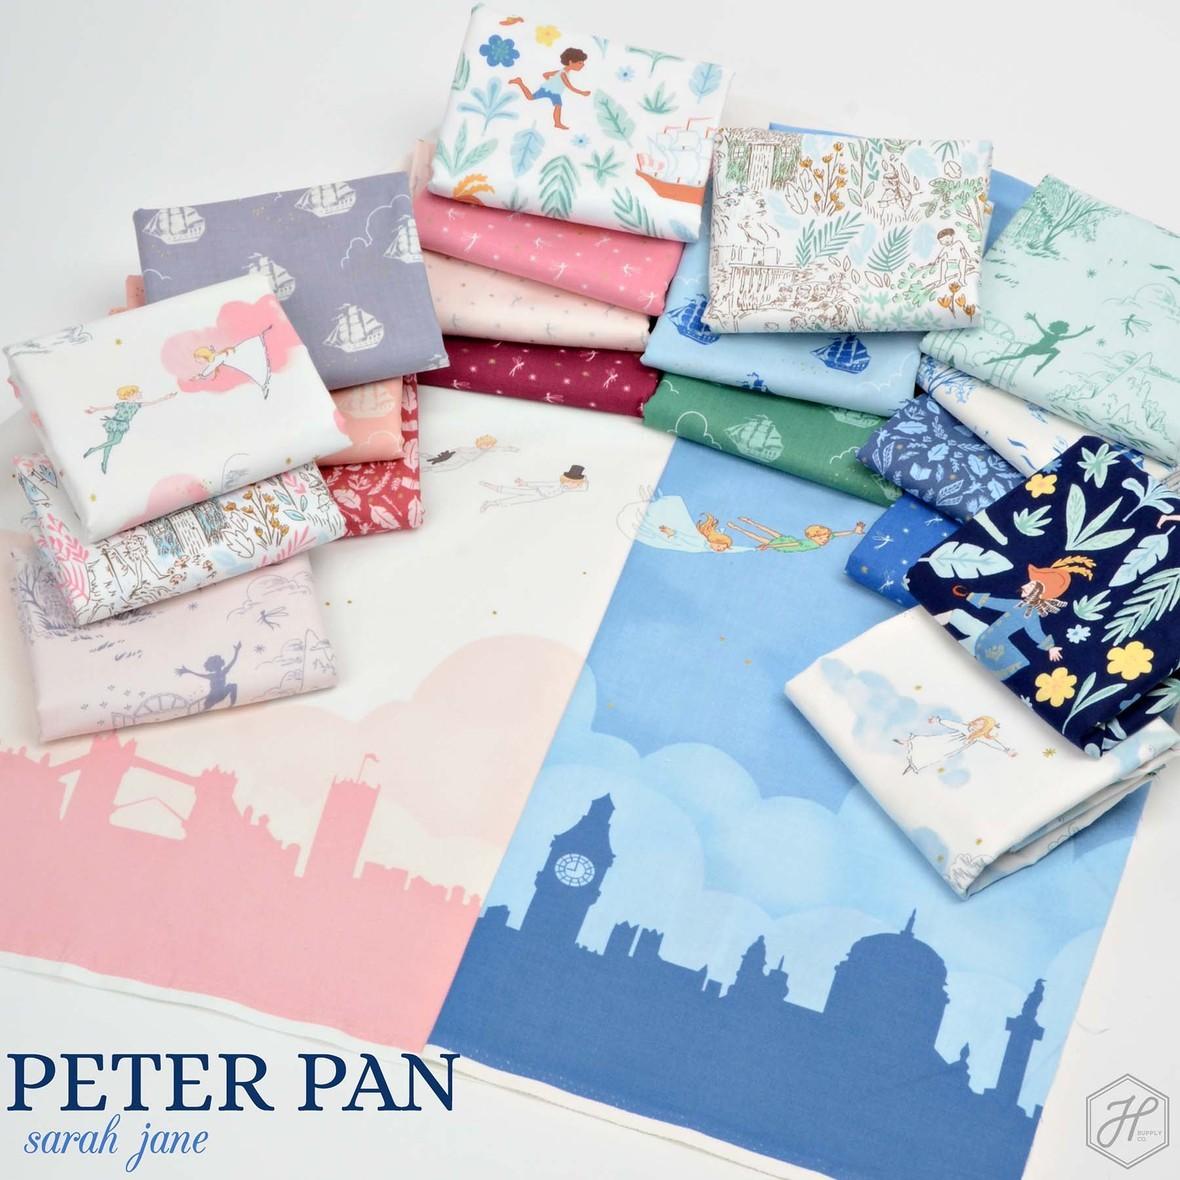 Peter Pan Fabric Poster Sarah Jane at Hawthorne Supply Co 2